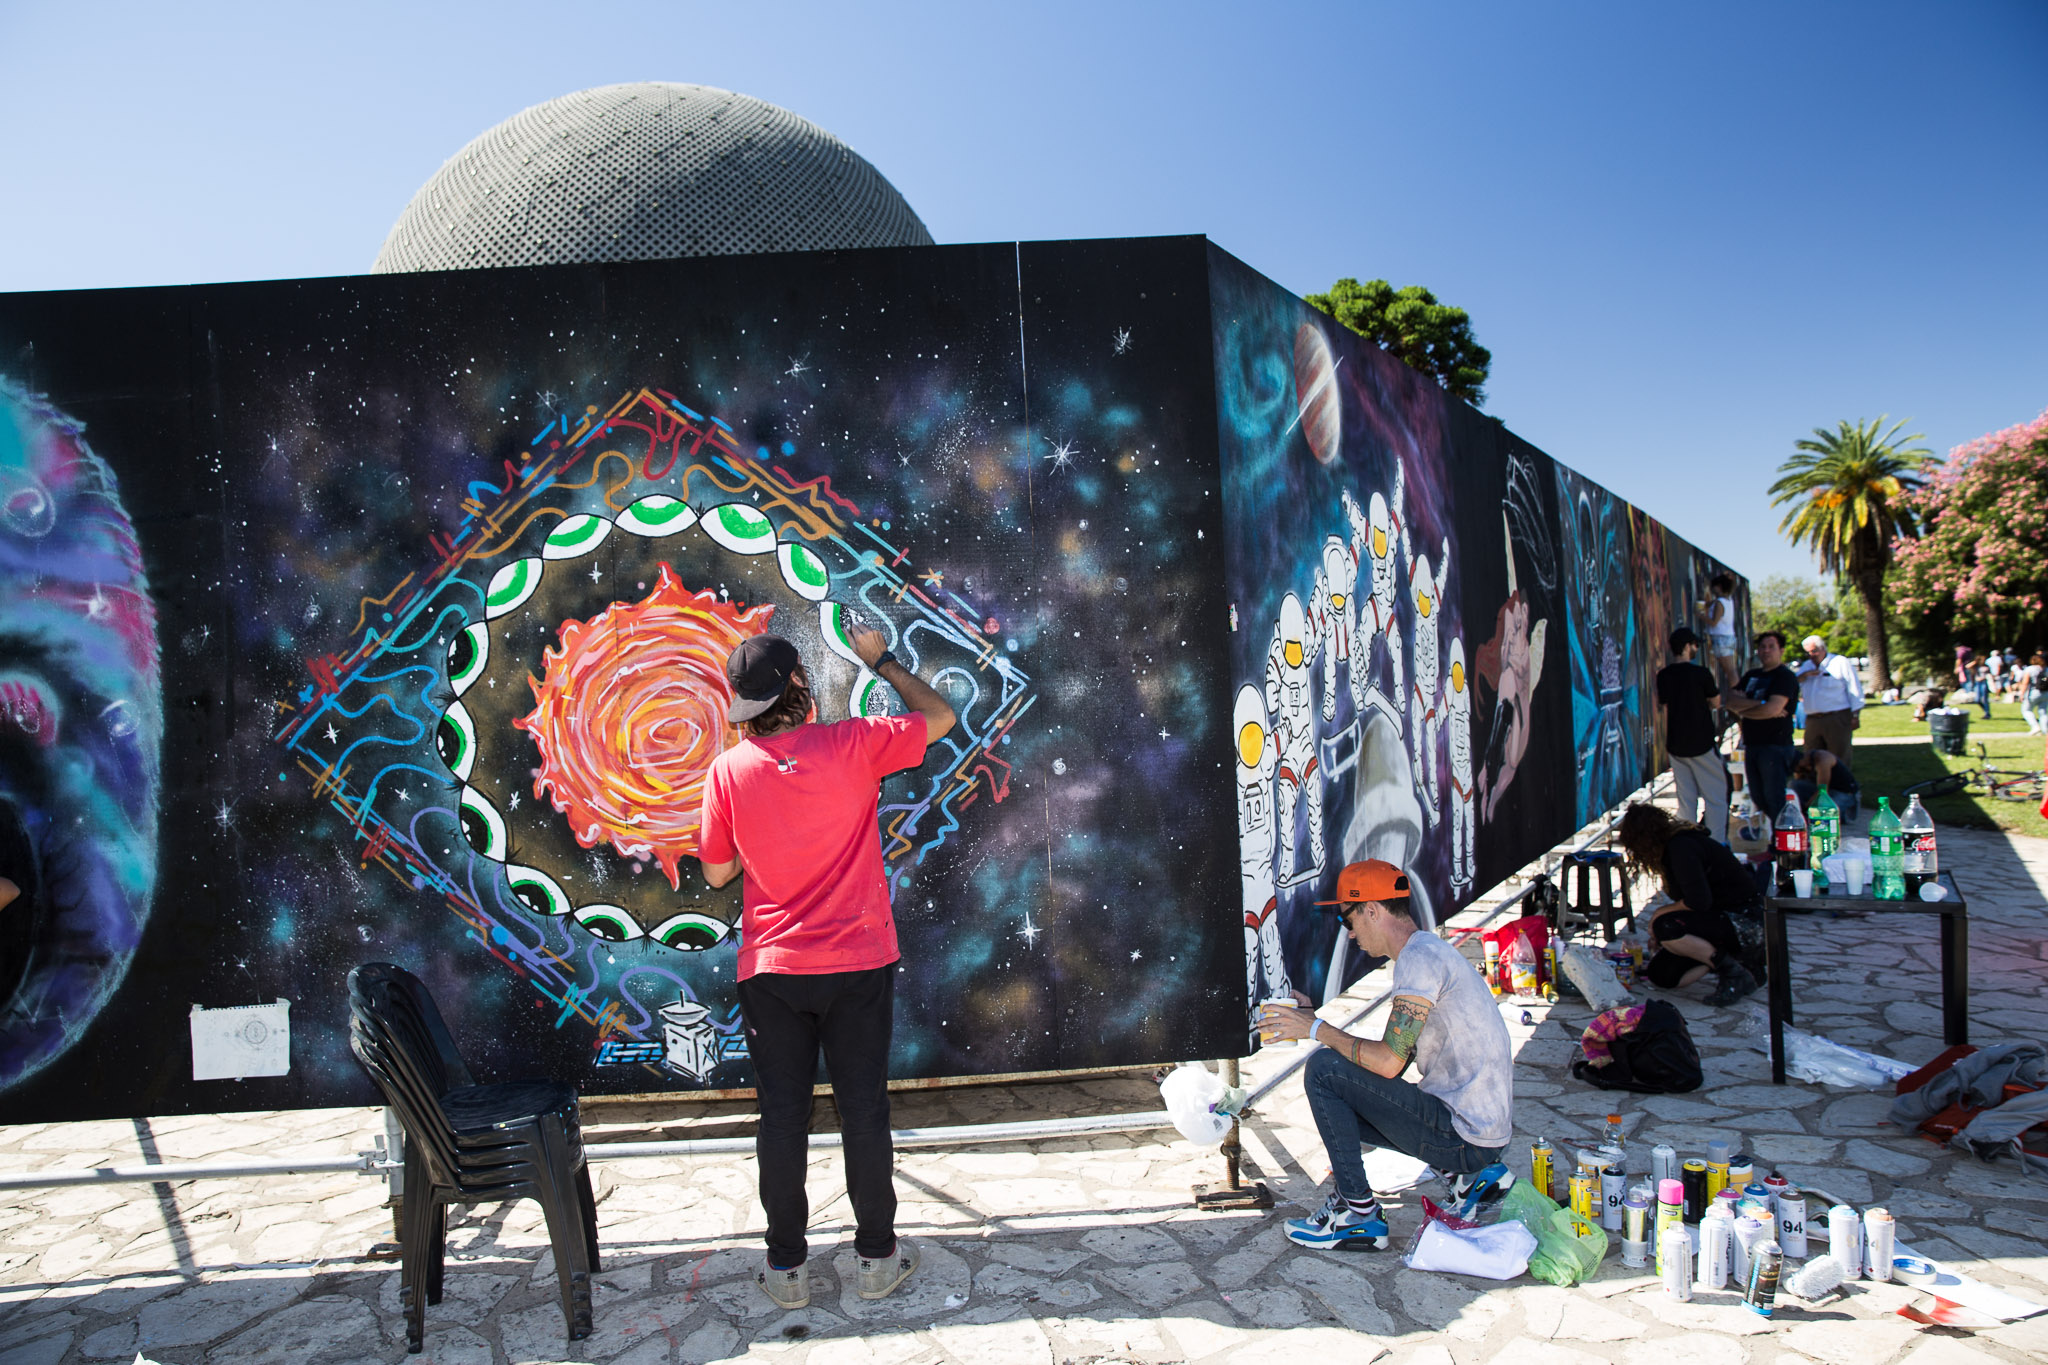 Buenos Aires lanzó el concurso Barrios Creativos